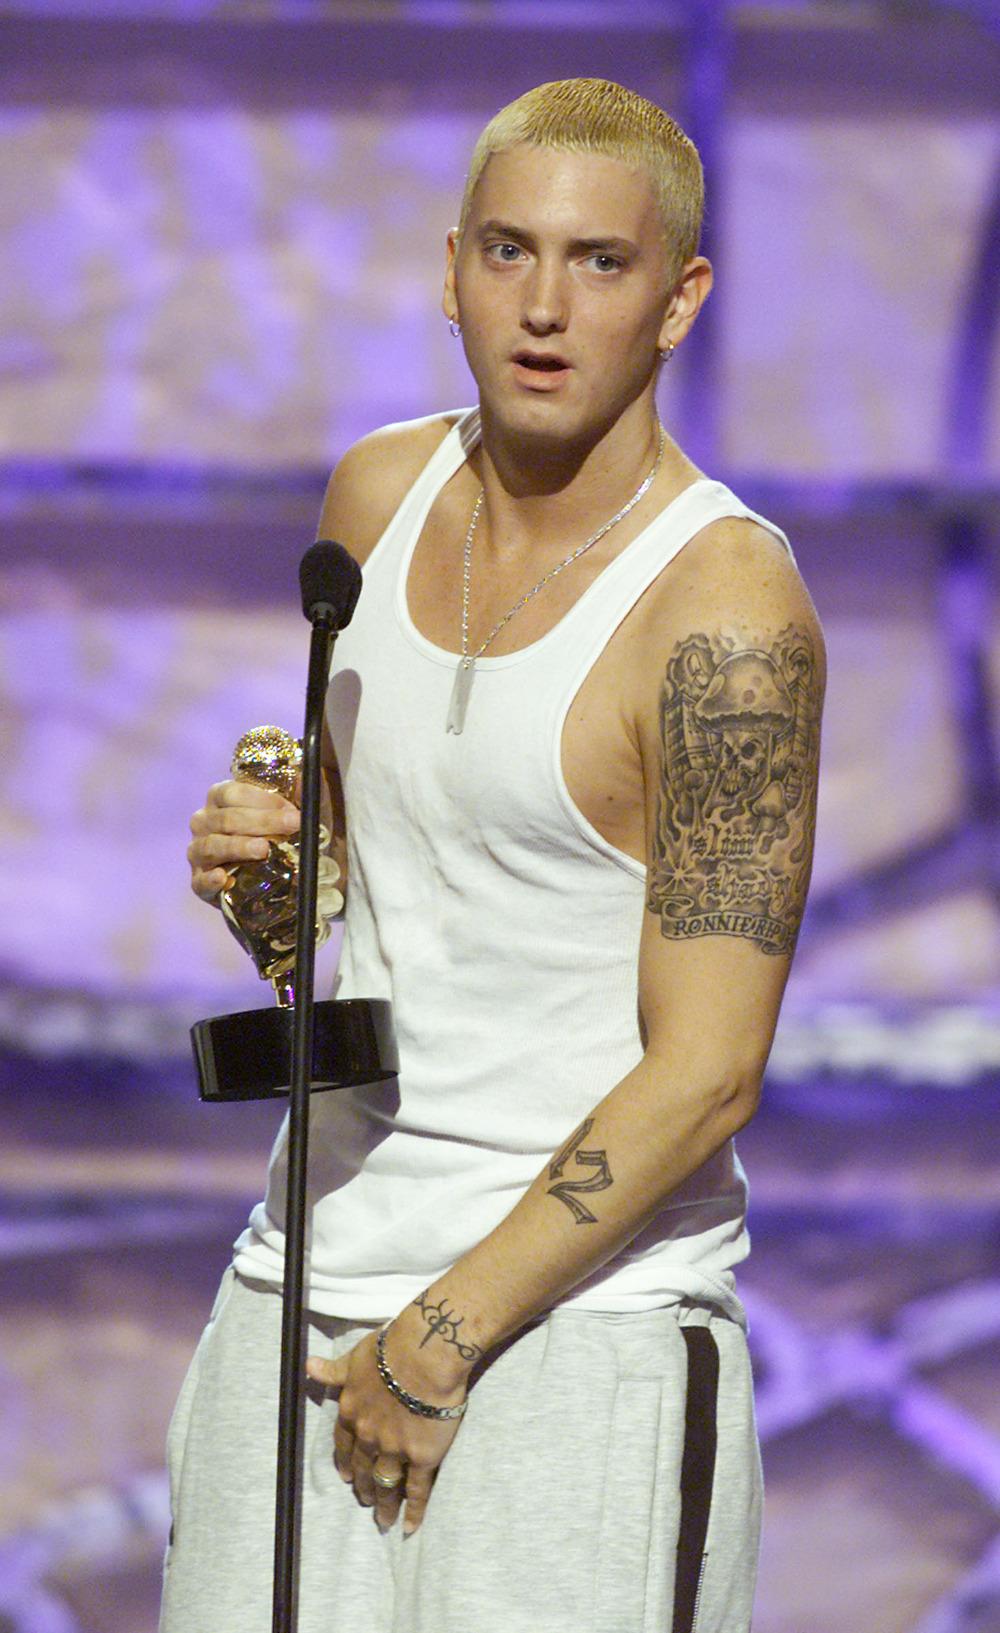 Eminem Photo 98 Of 142 Pics Wallpaper Photo 727140